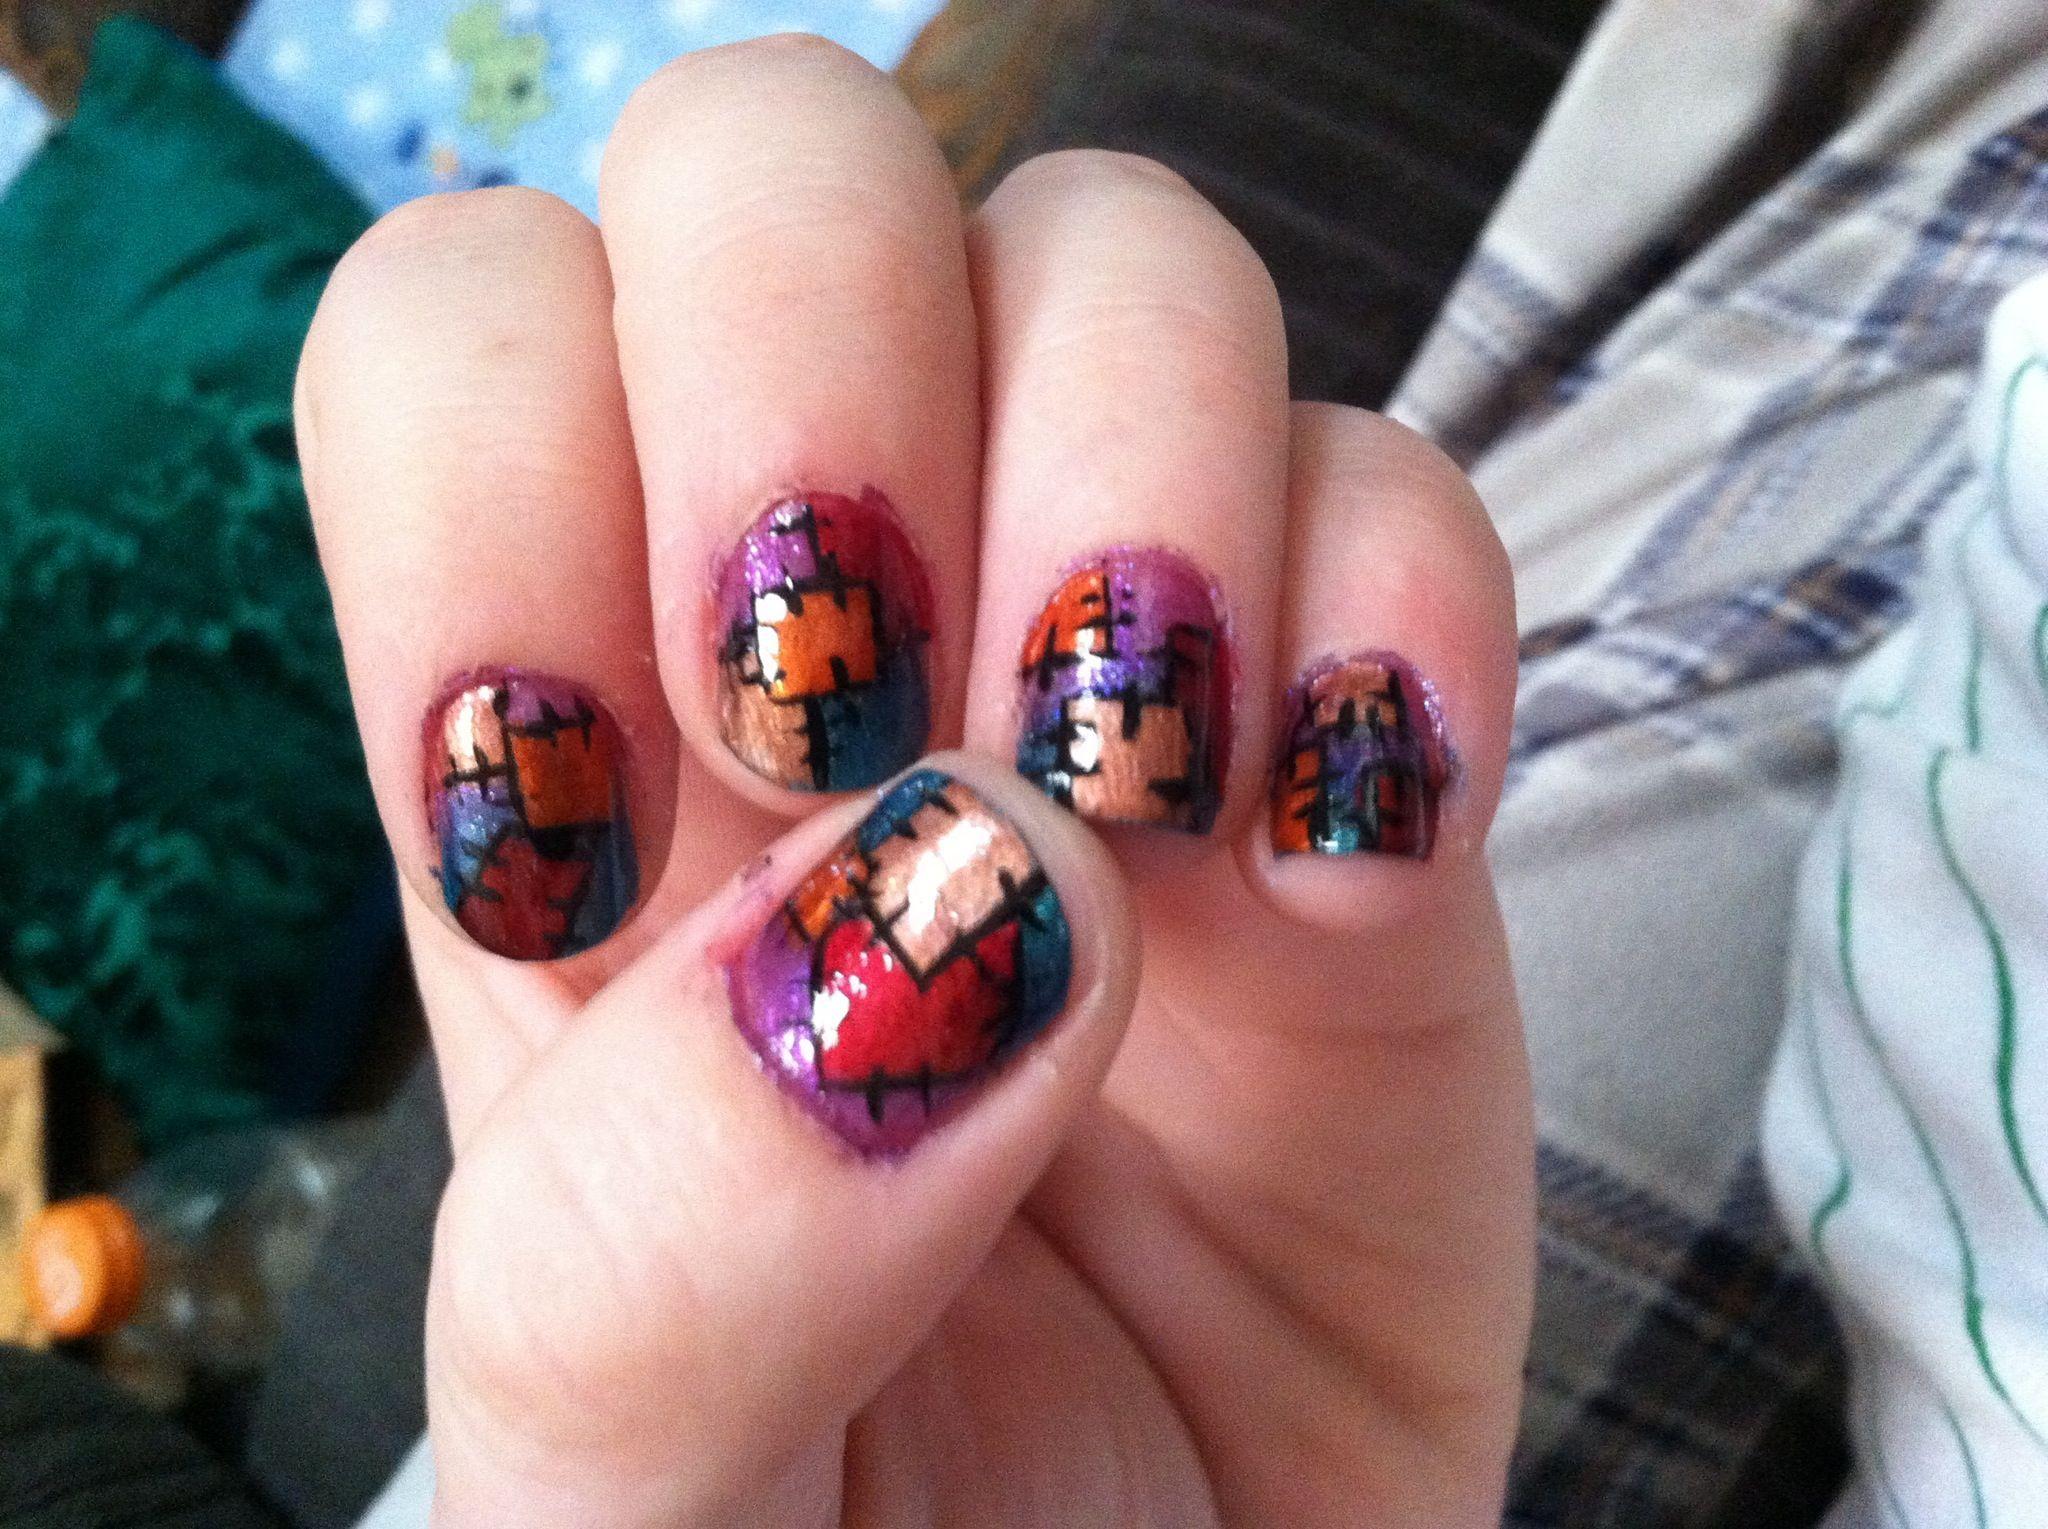 Patchwork quilt nails for autumn